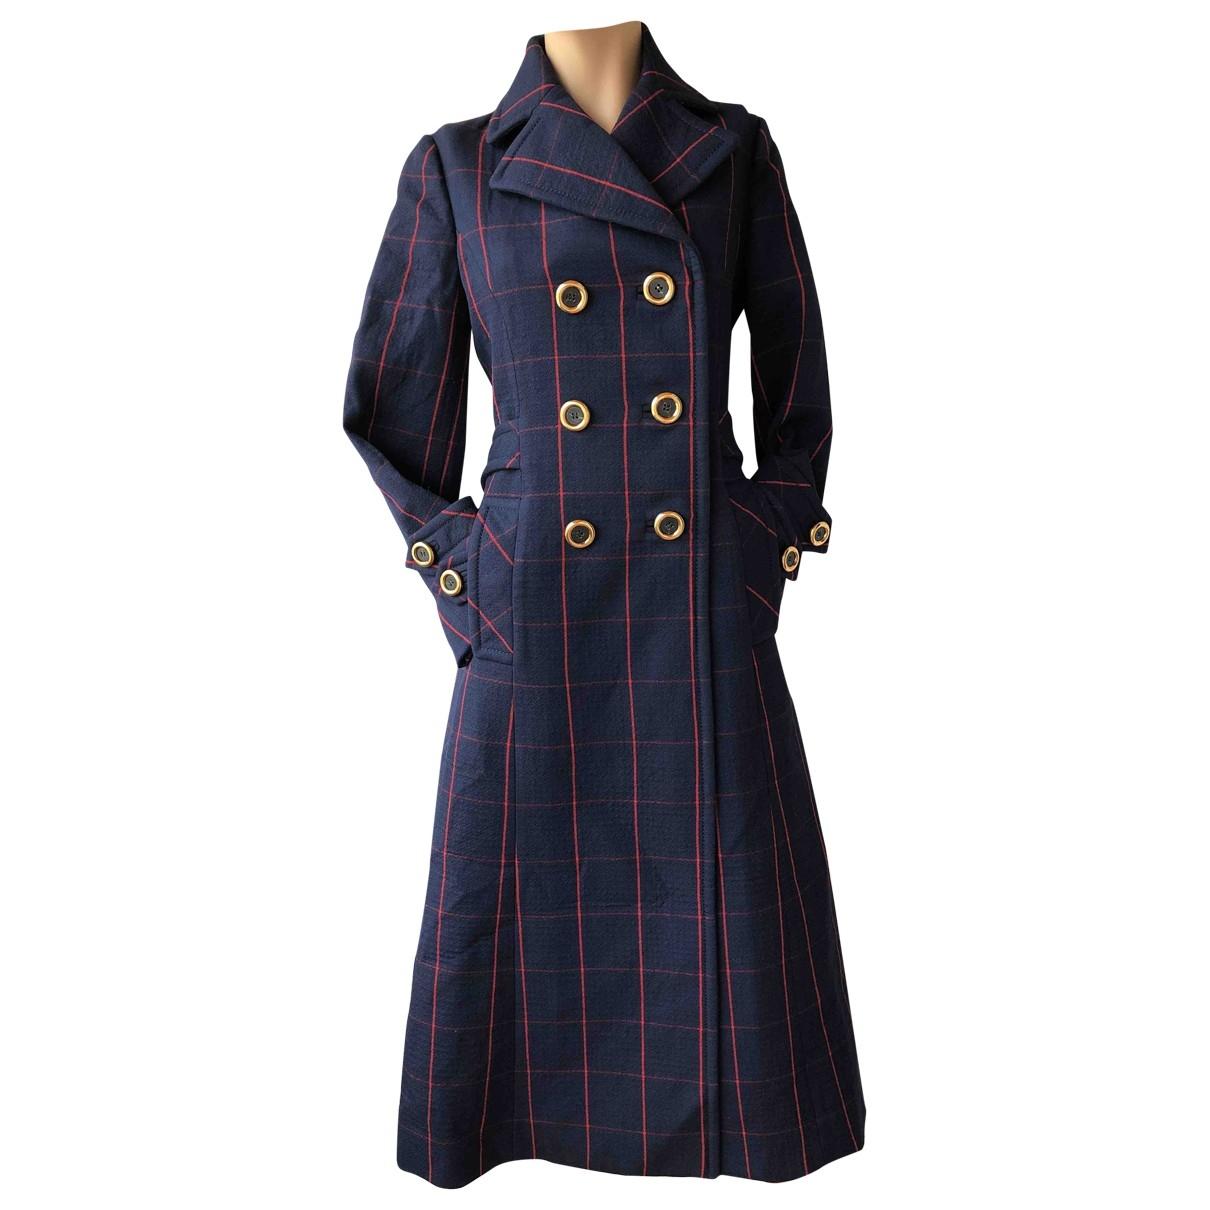 Miu Miu \N Navy Wool coat for Women 38 IT